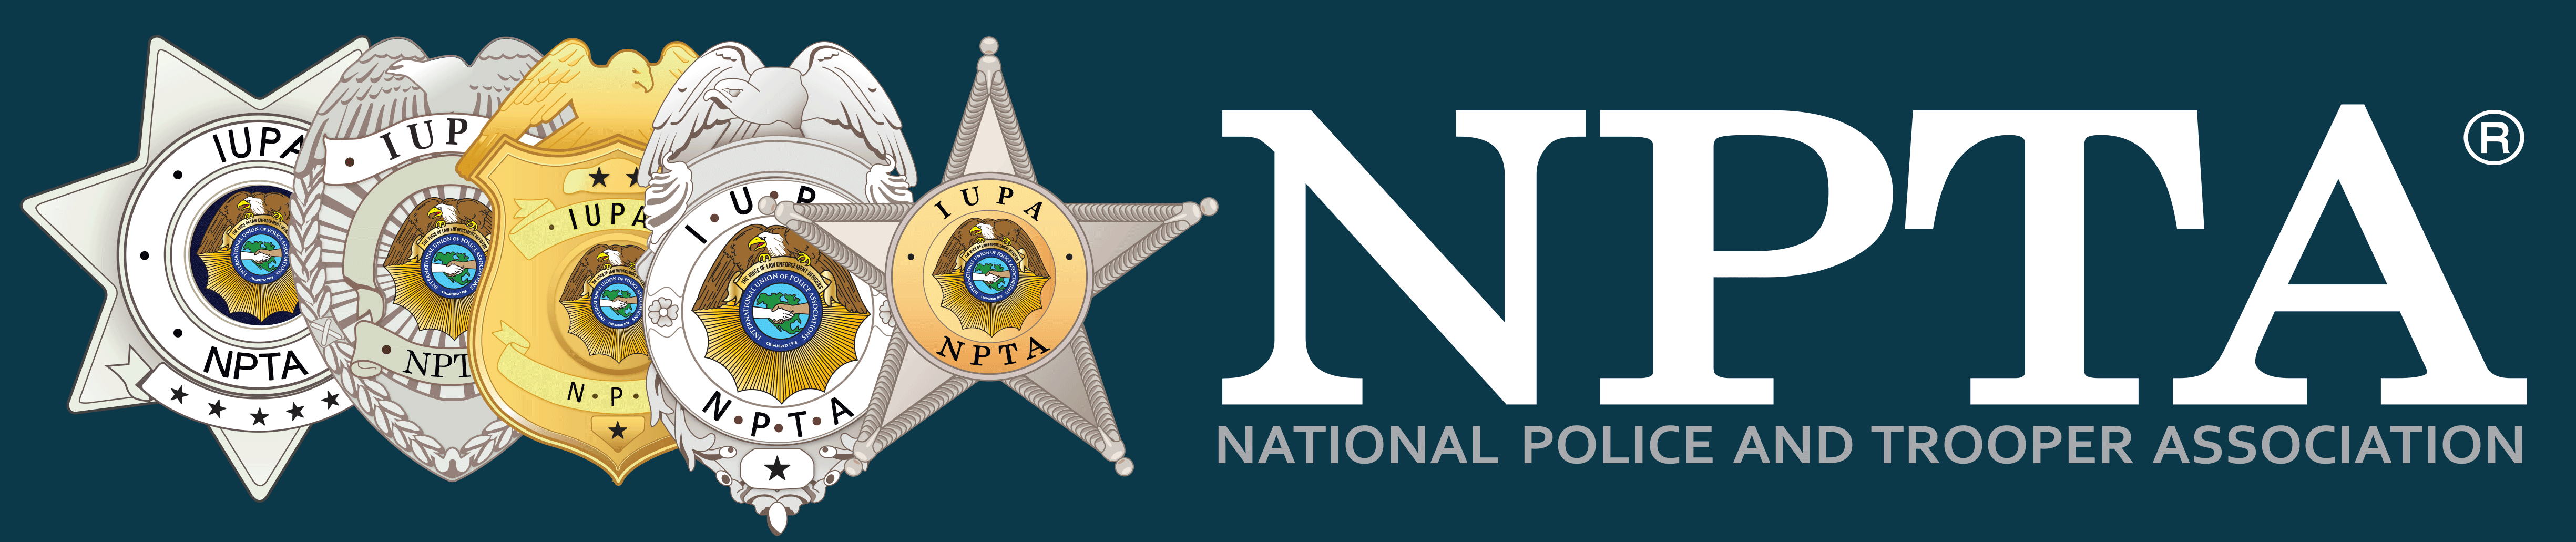 NPTA Donations